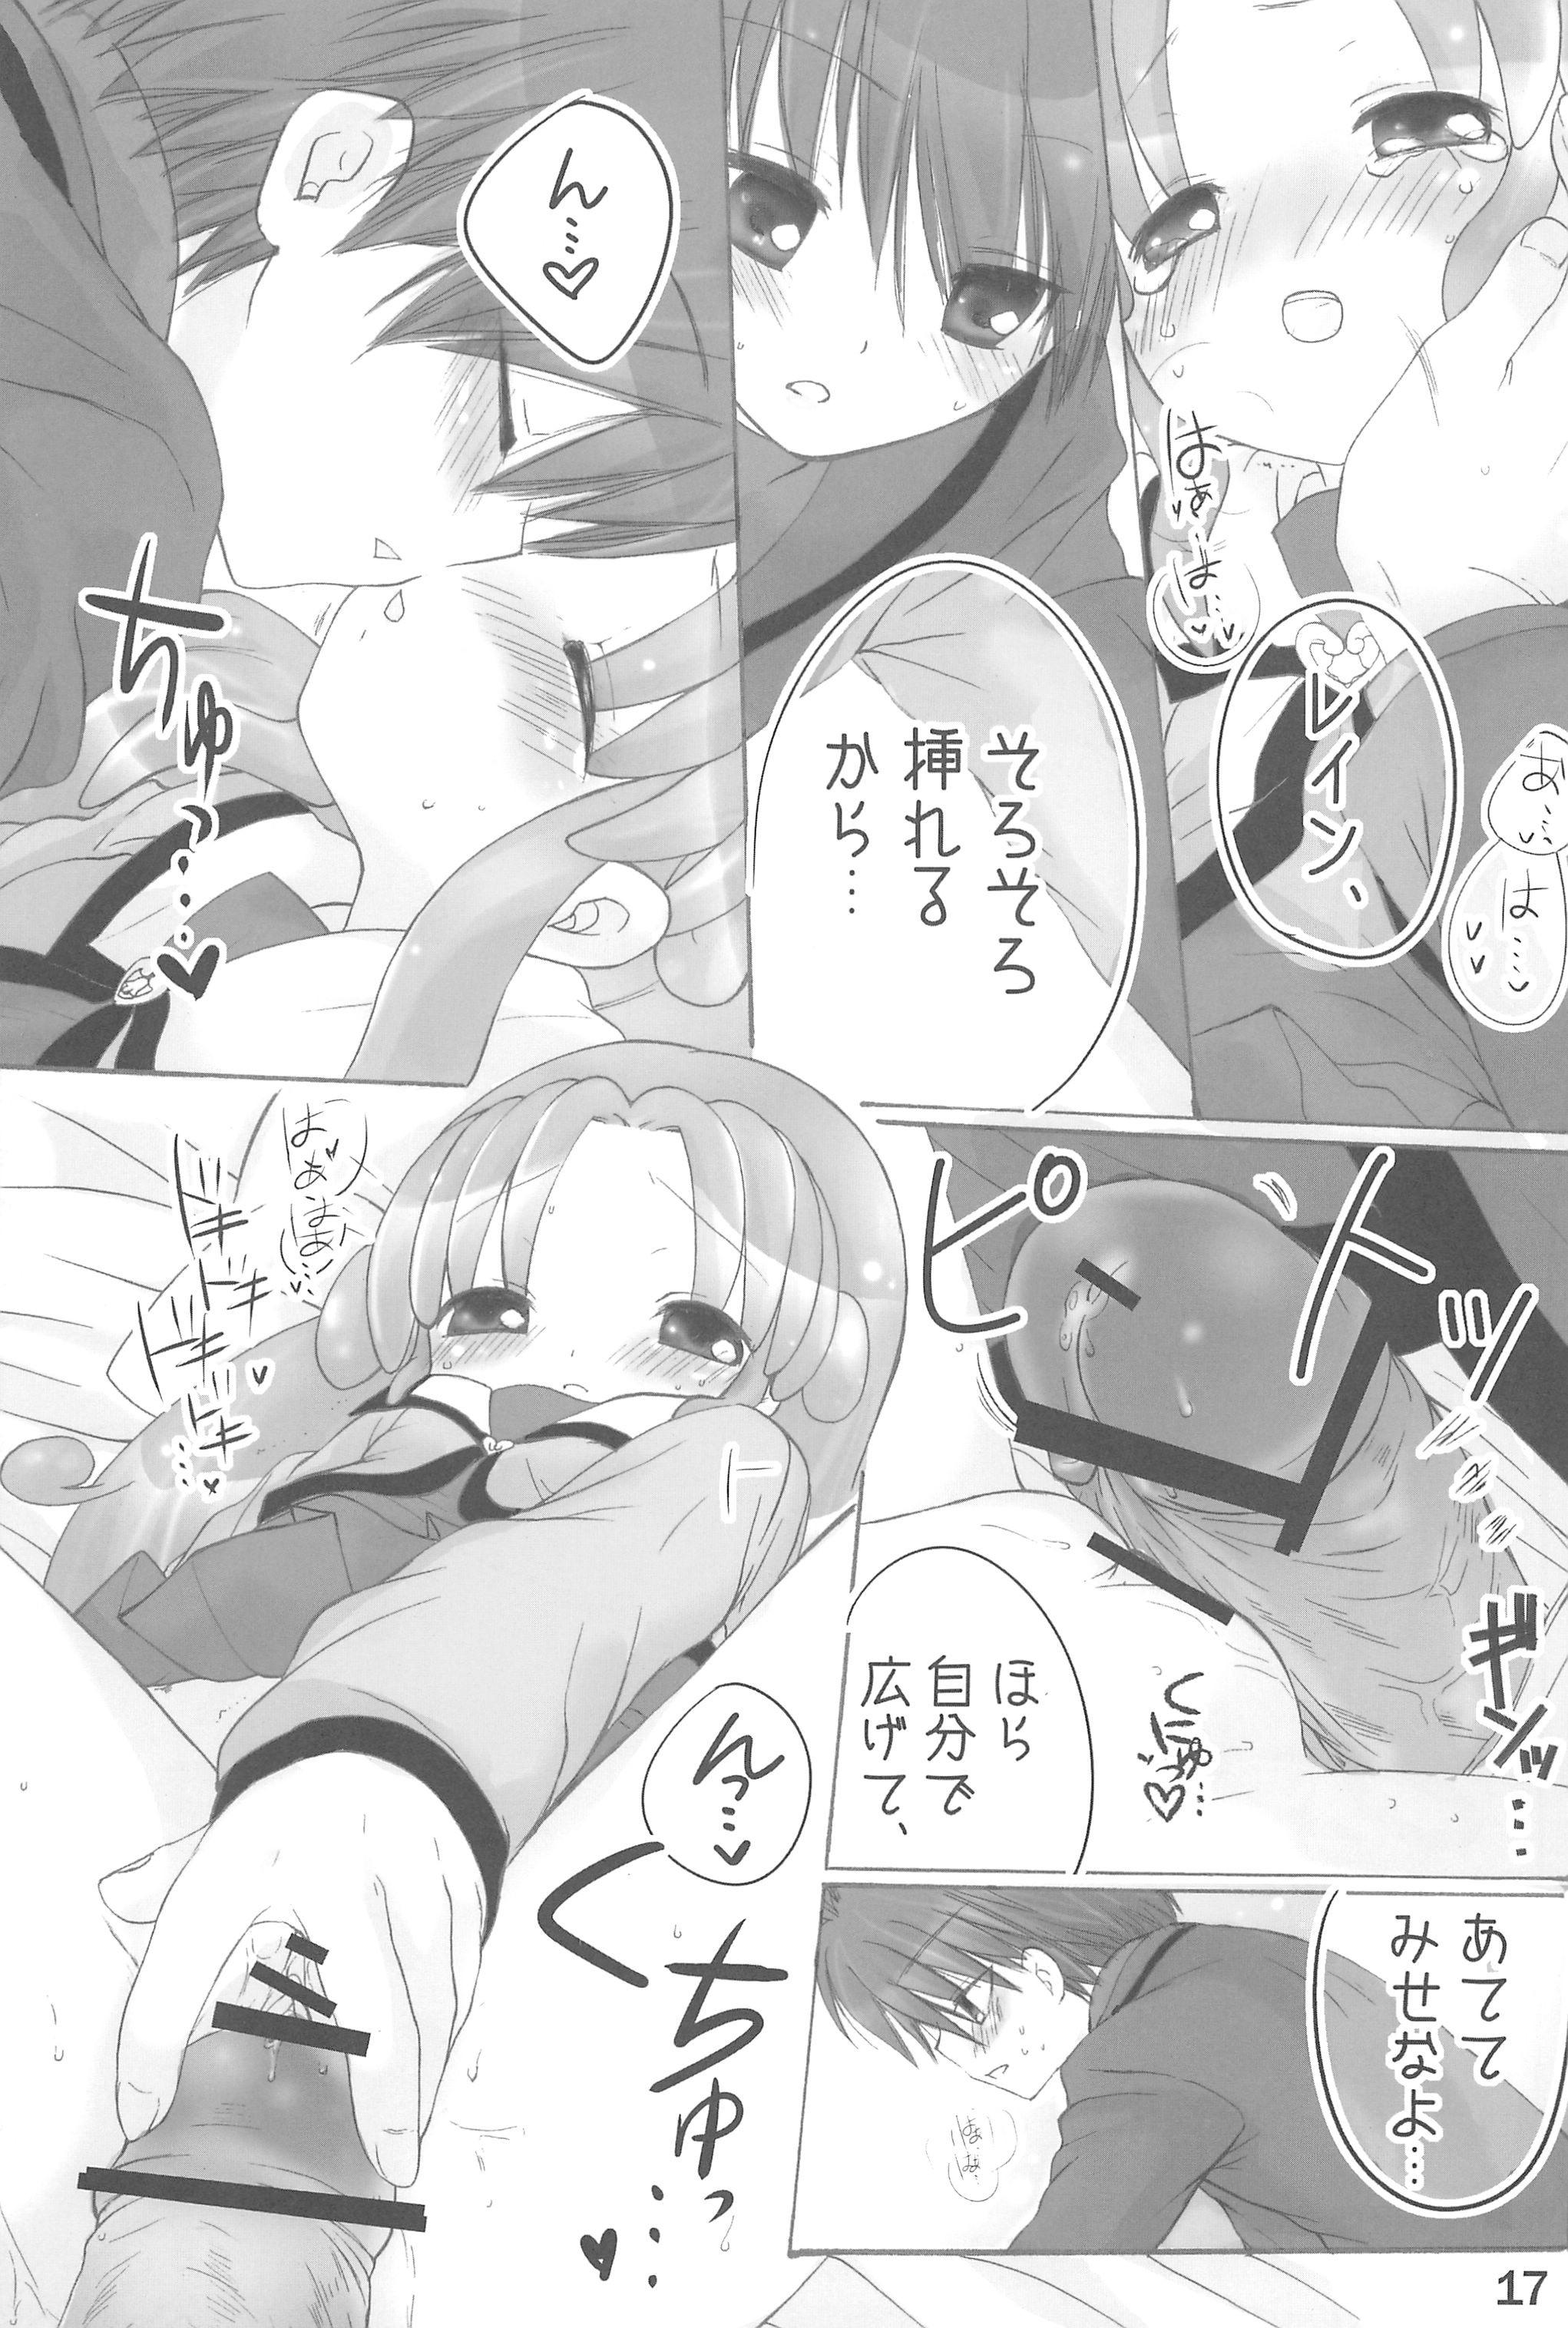 Rein-sama, Goyoujin! 16